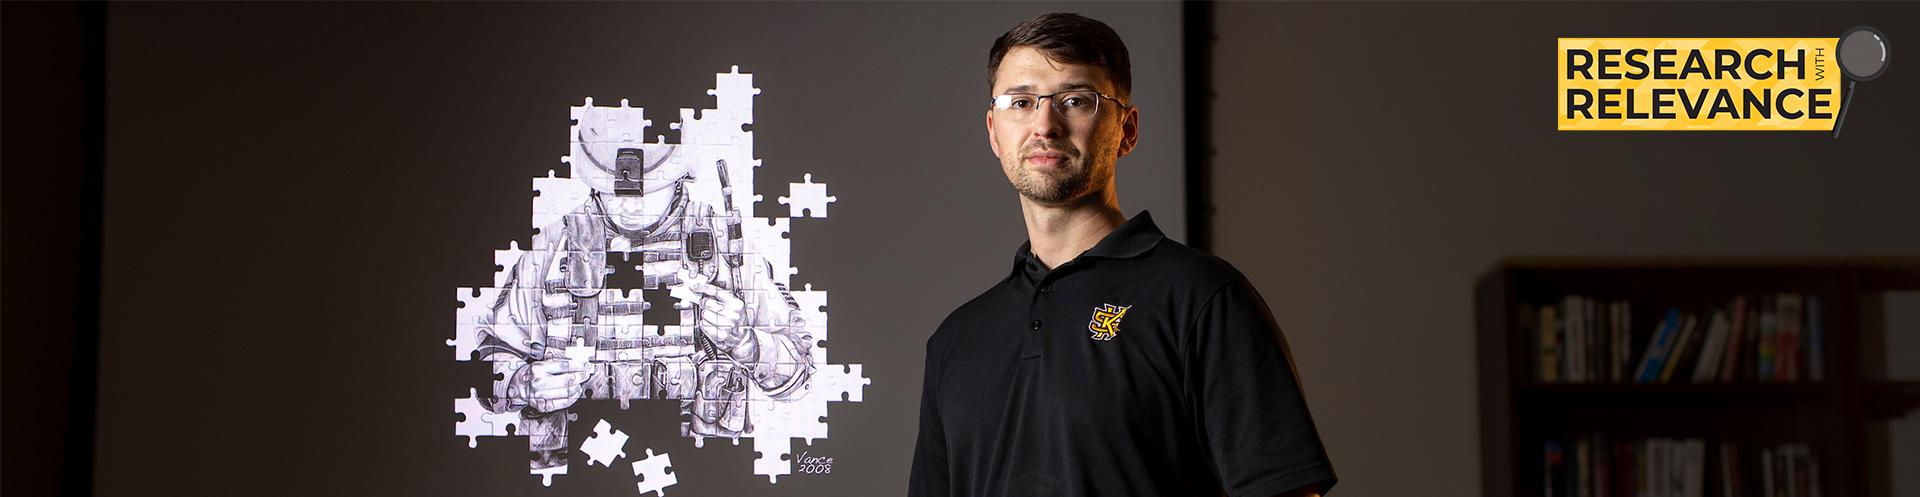 KSU psychology professor studies effects of military stress